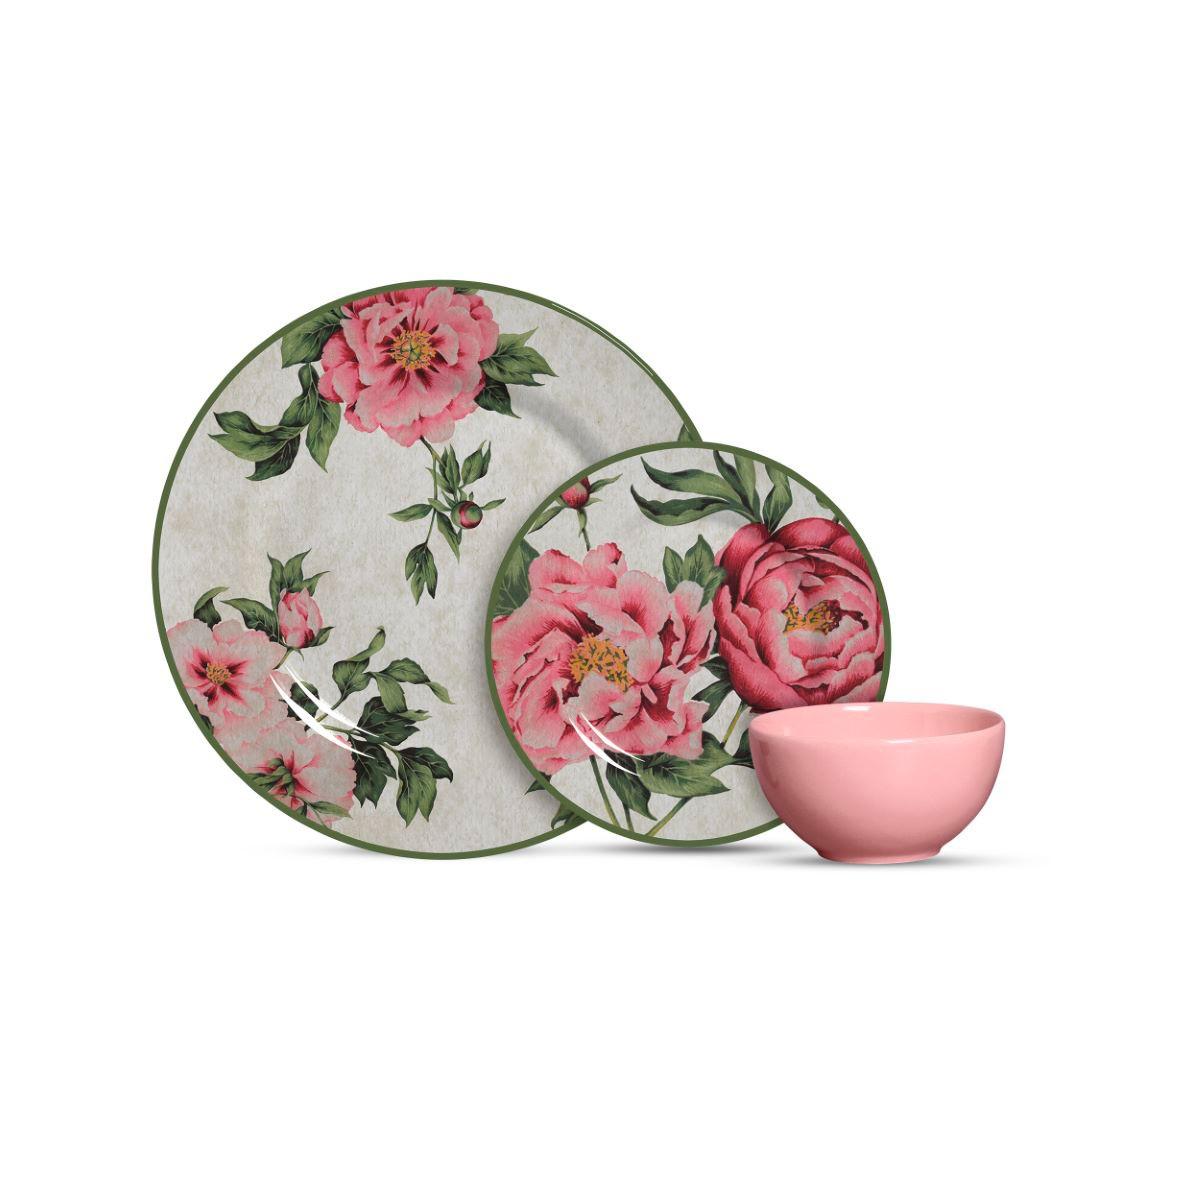 Aparelho De Jantar Cerâmica Peonia 12 Pç